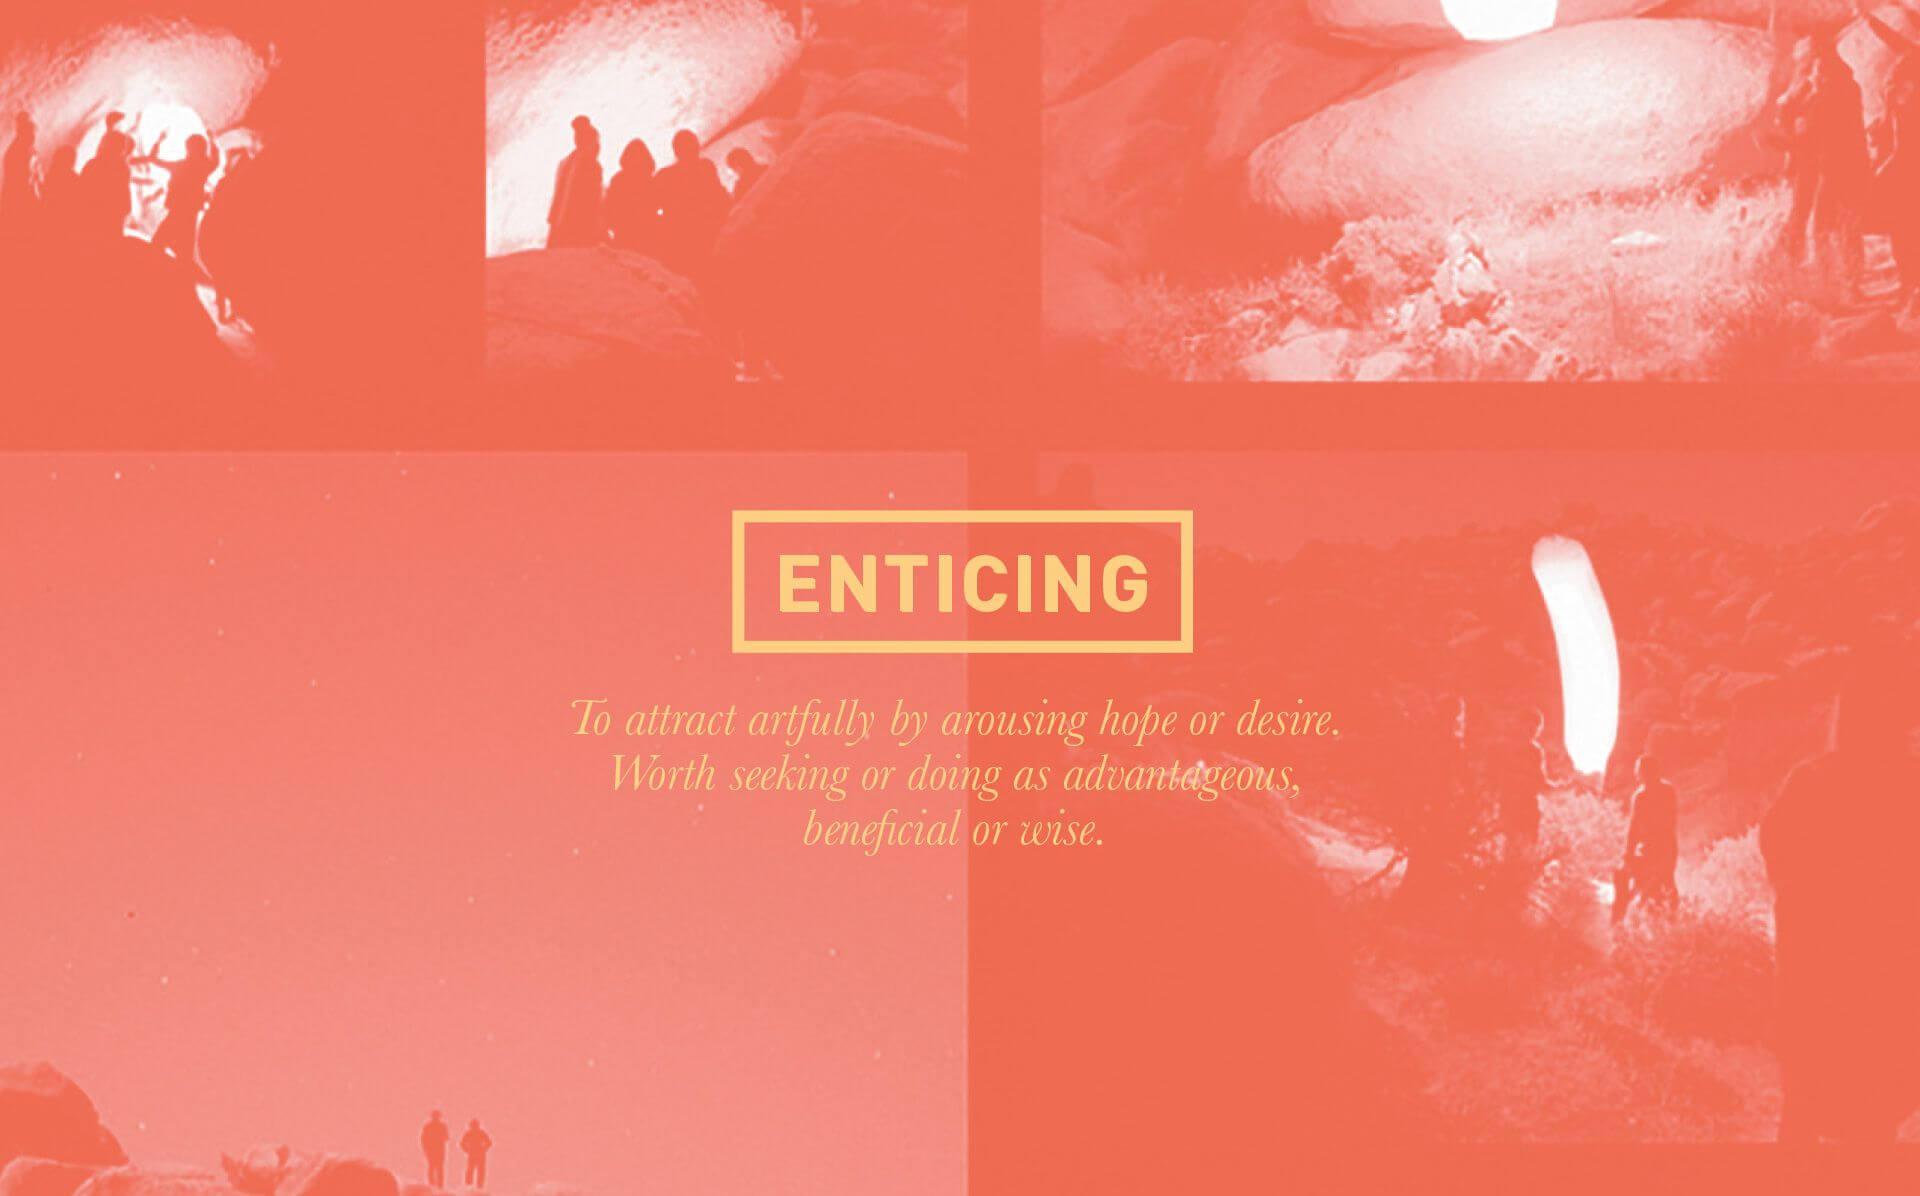 bunkr-enticing